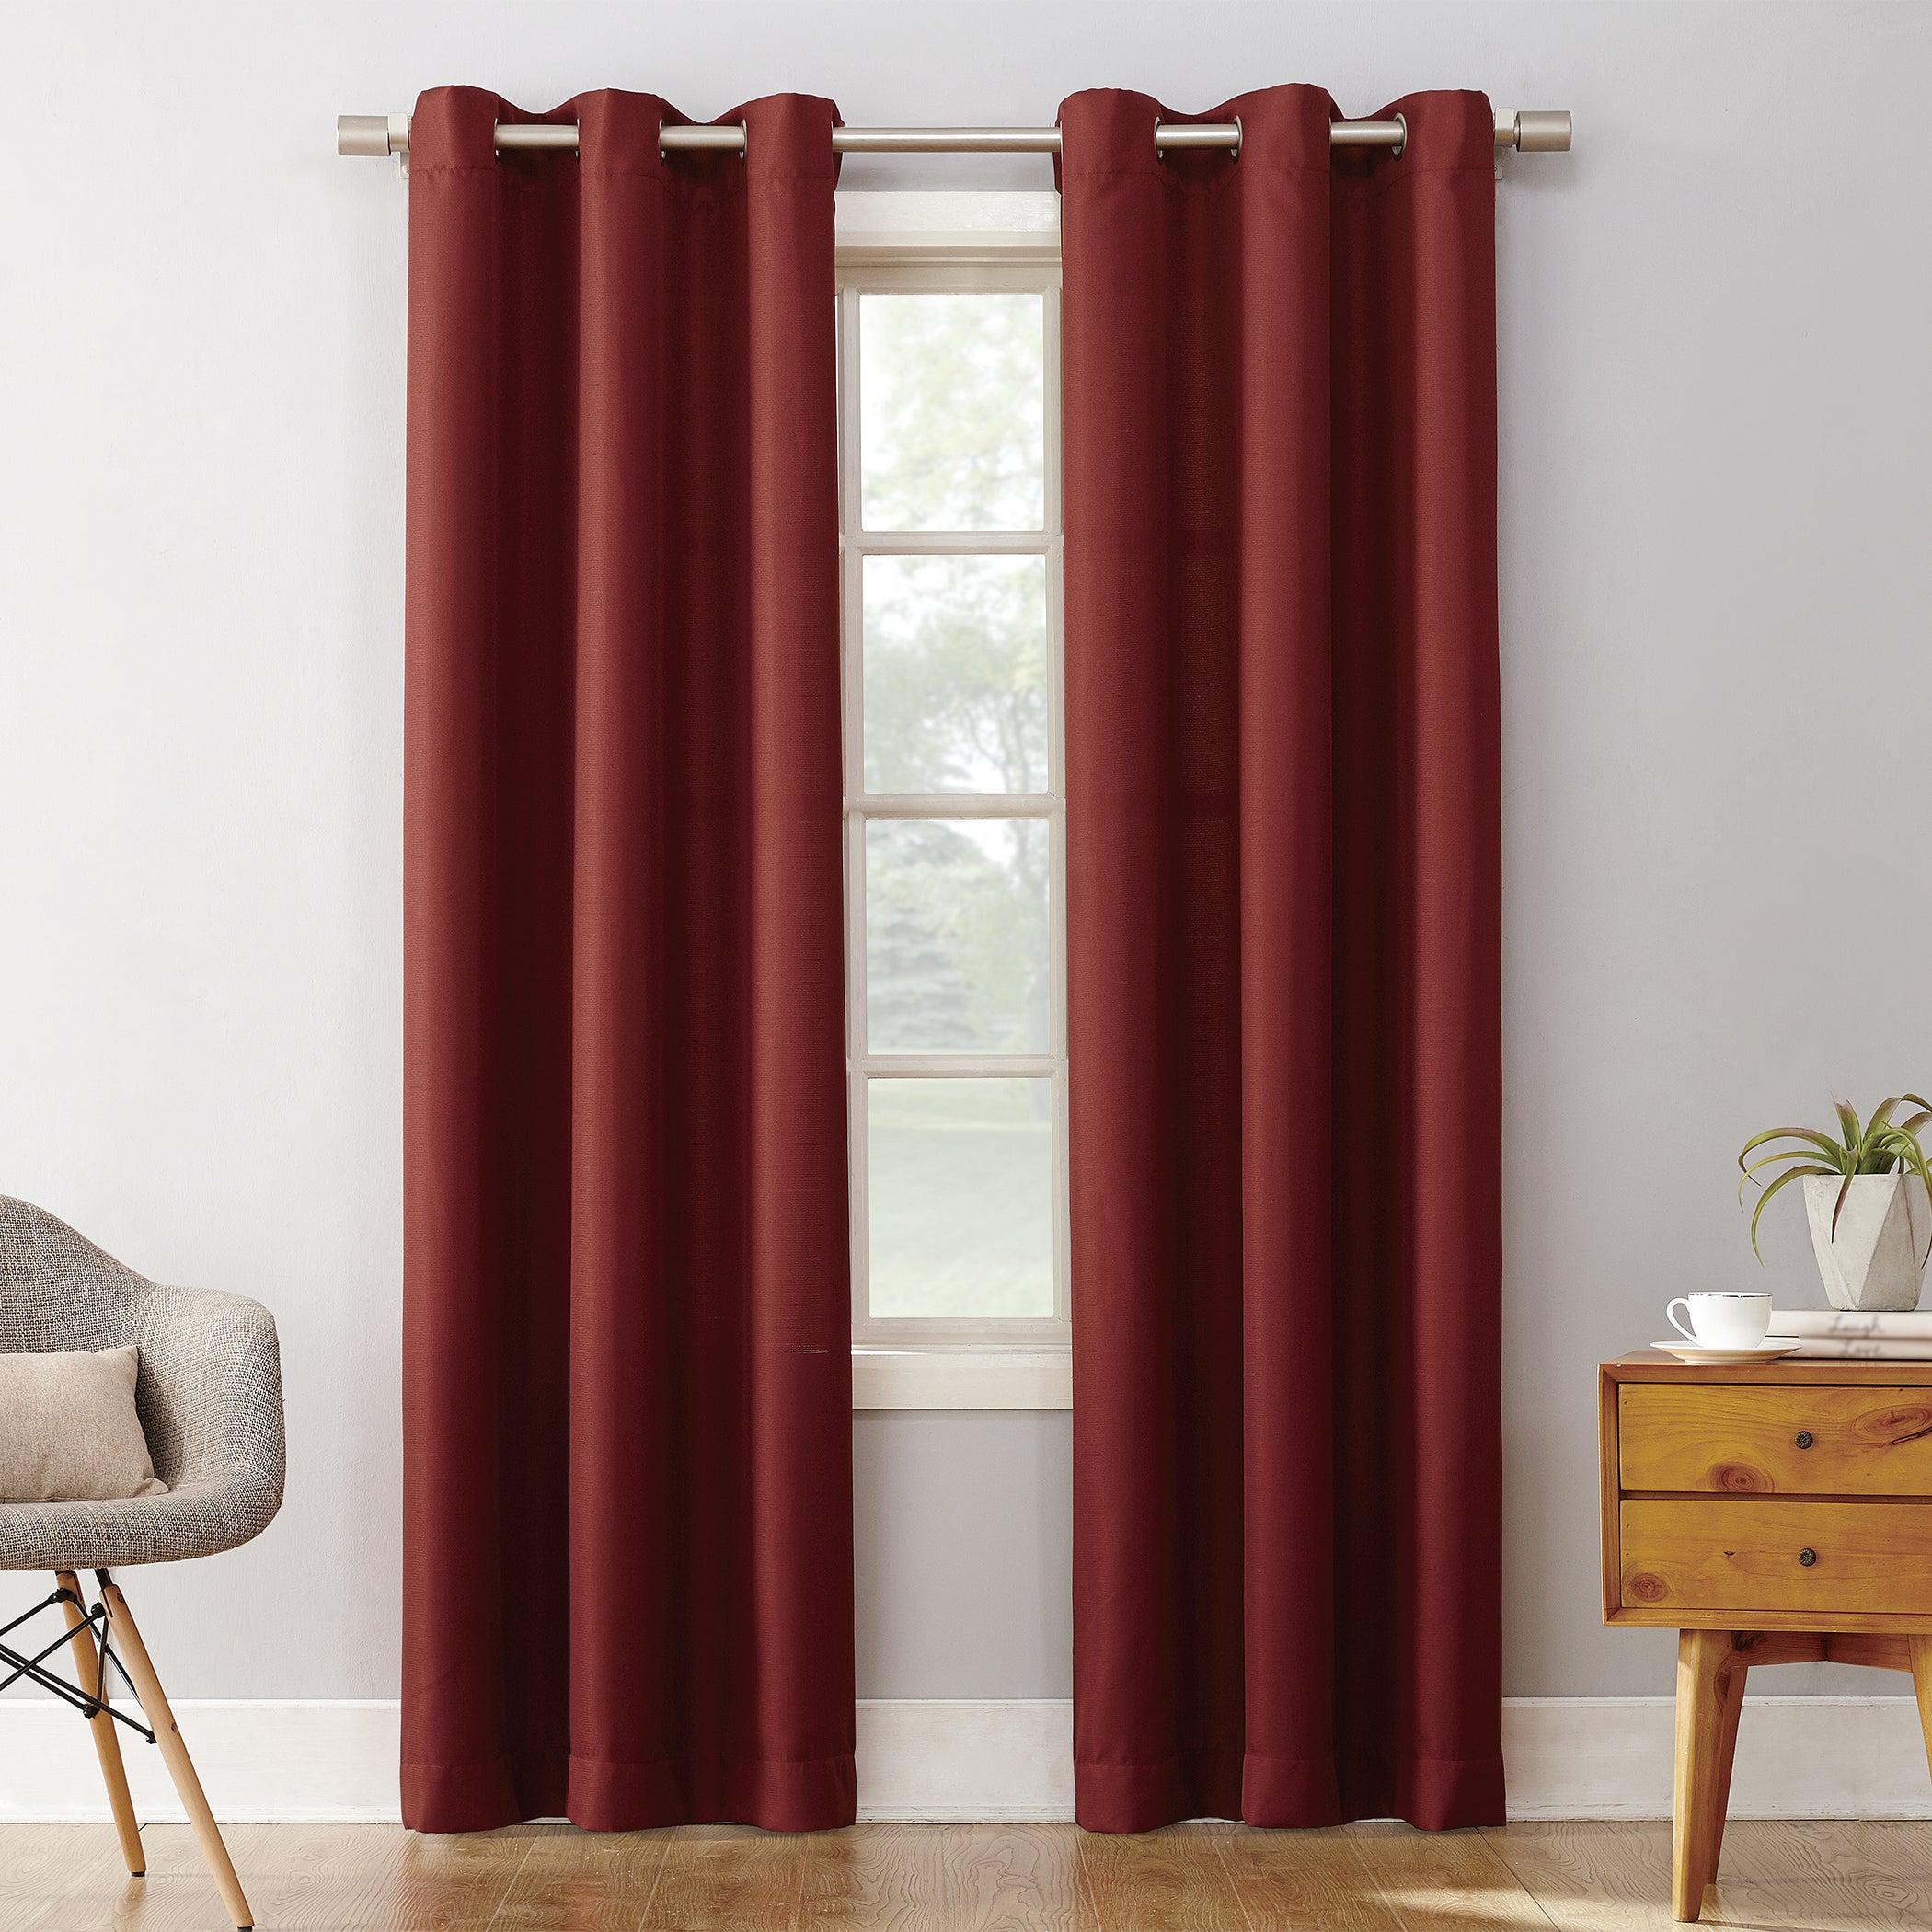 Shop Copper Grove Speedwell Grommet Window Curtain Panel Pertaining To Copper Grove Speedwell Grommet Window Curtain Panels (View 6 of 20)